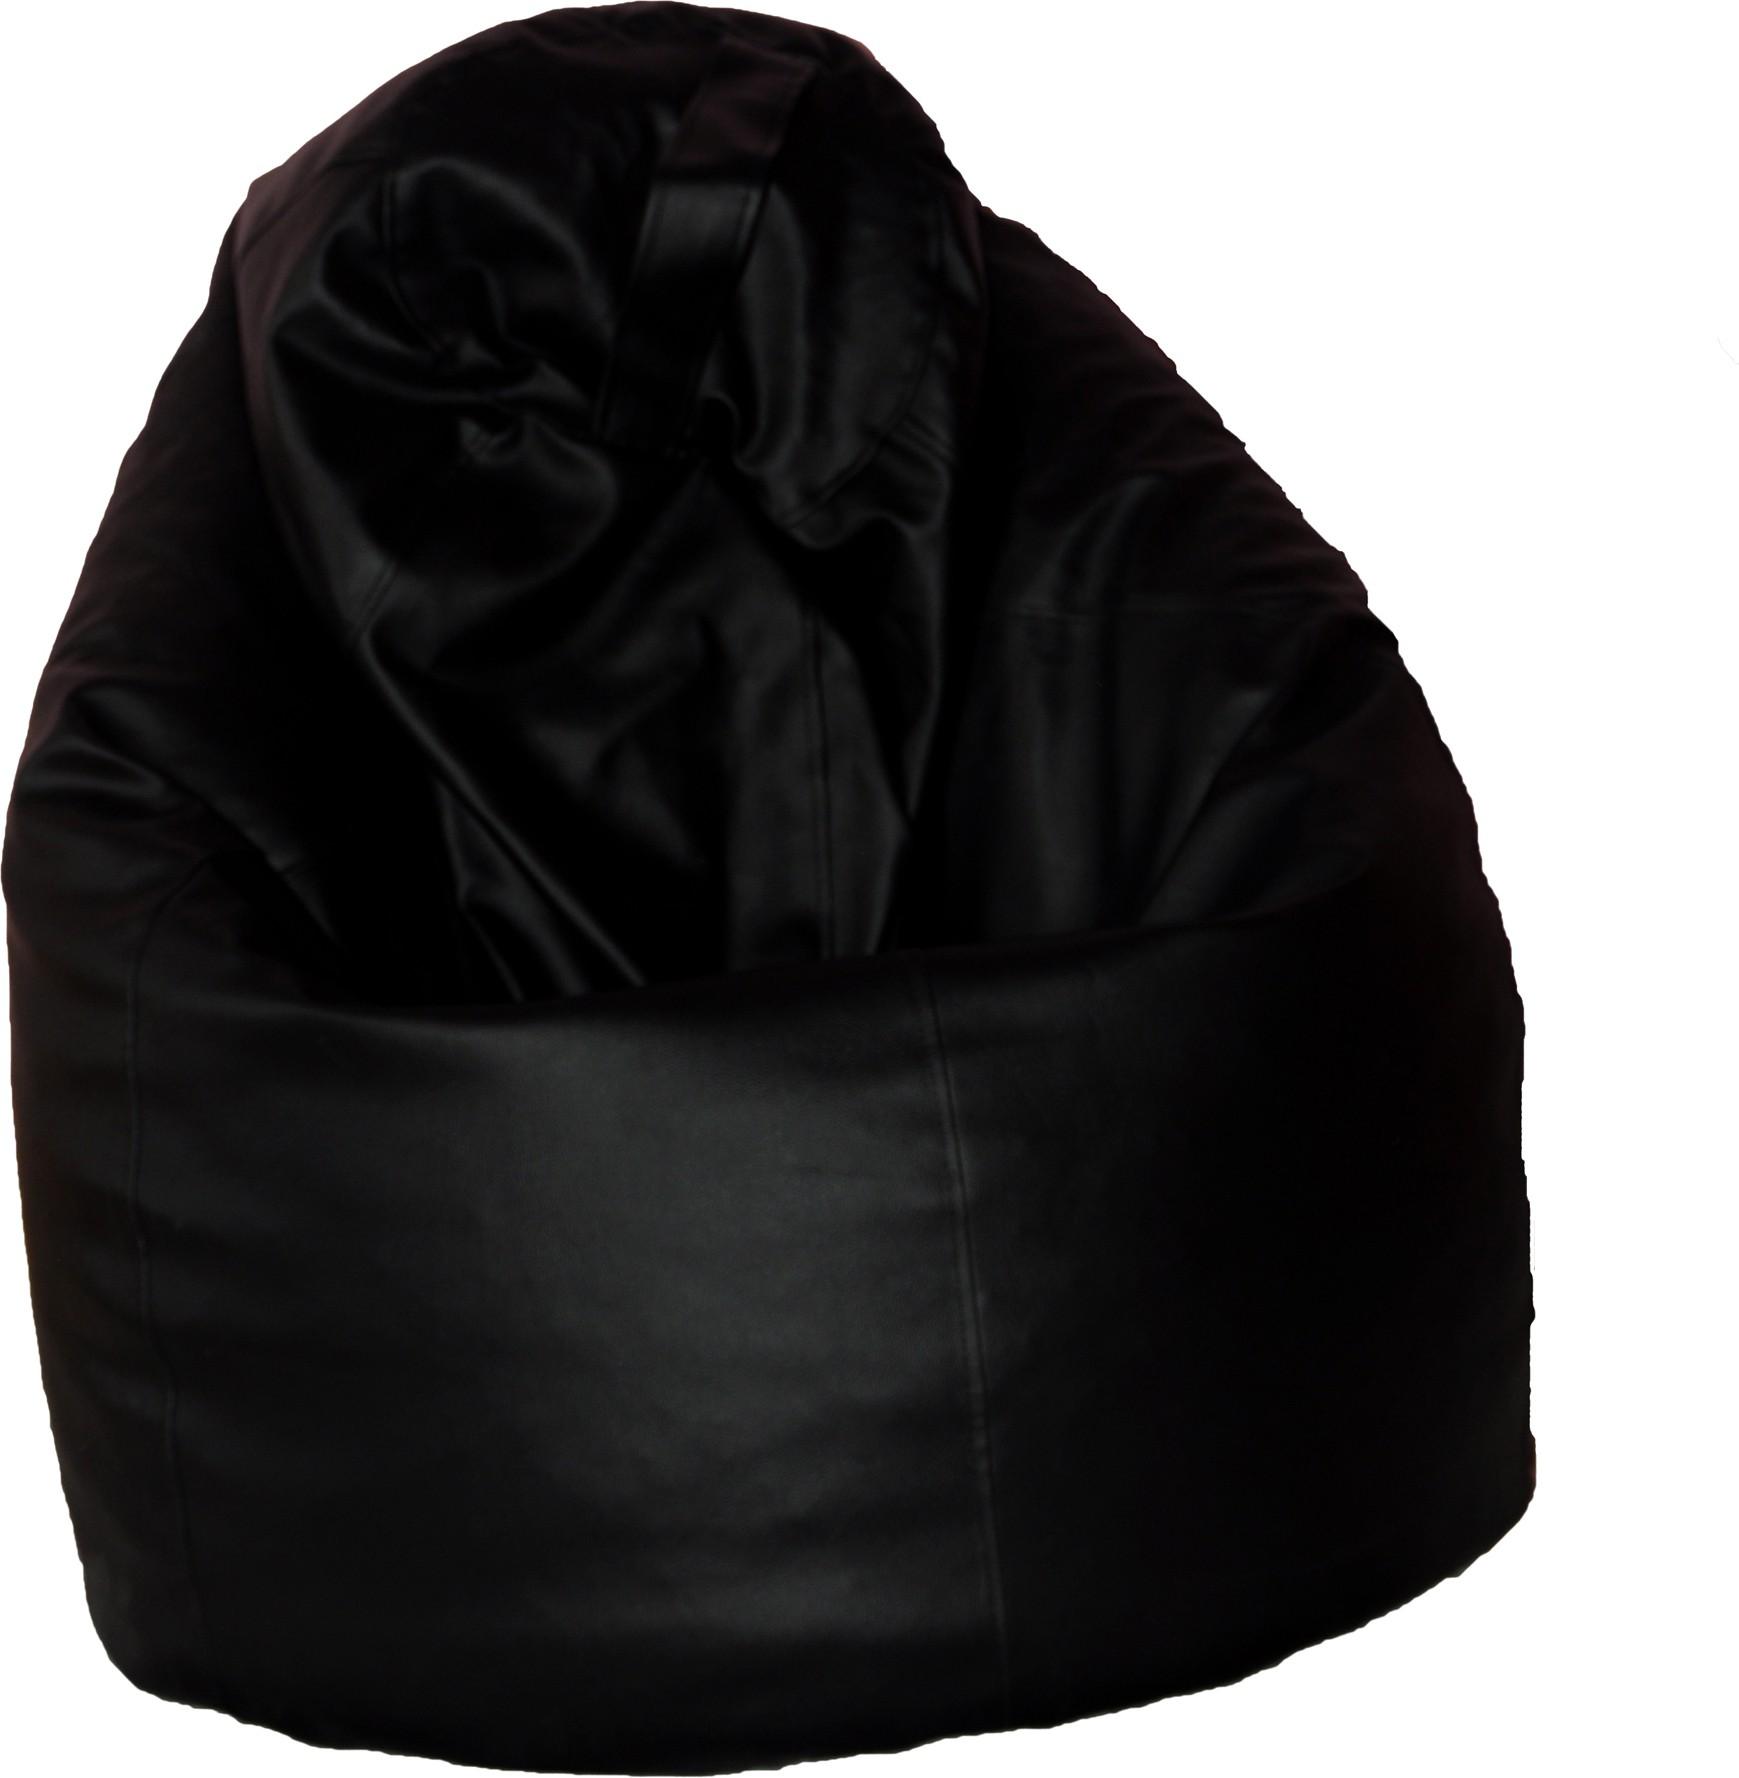 View Amaze XXXL Bean Bag Cover(Black) Furniture (Amaze)